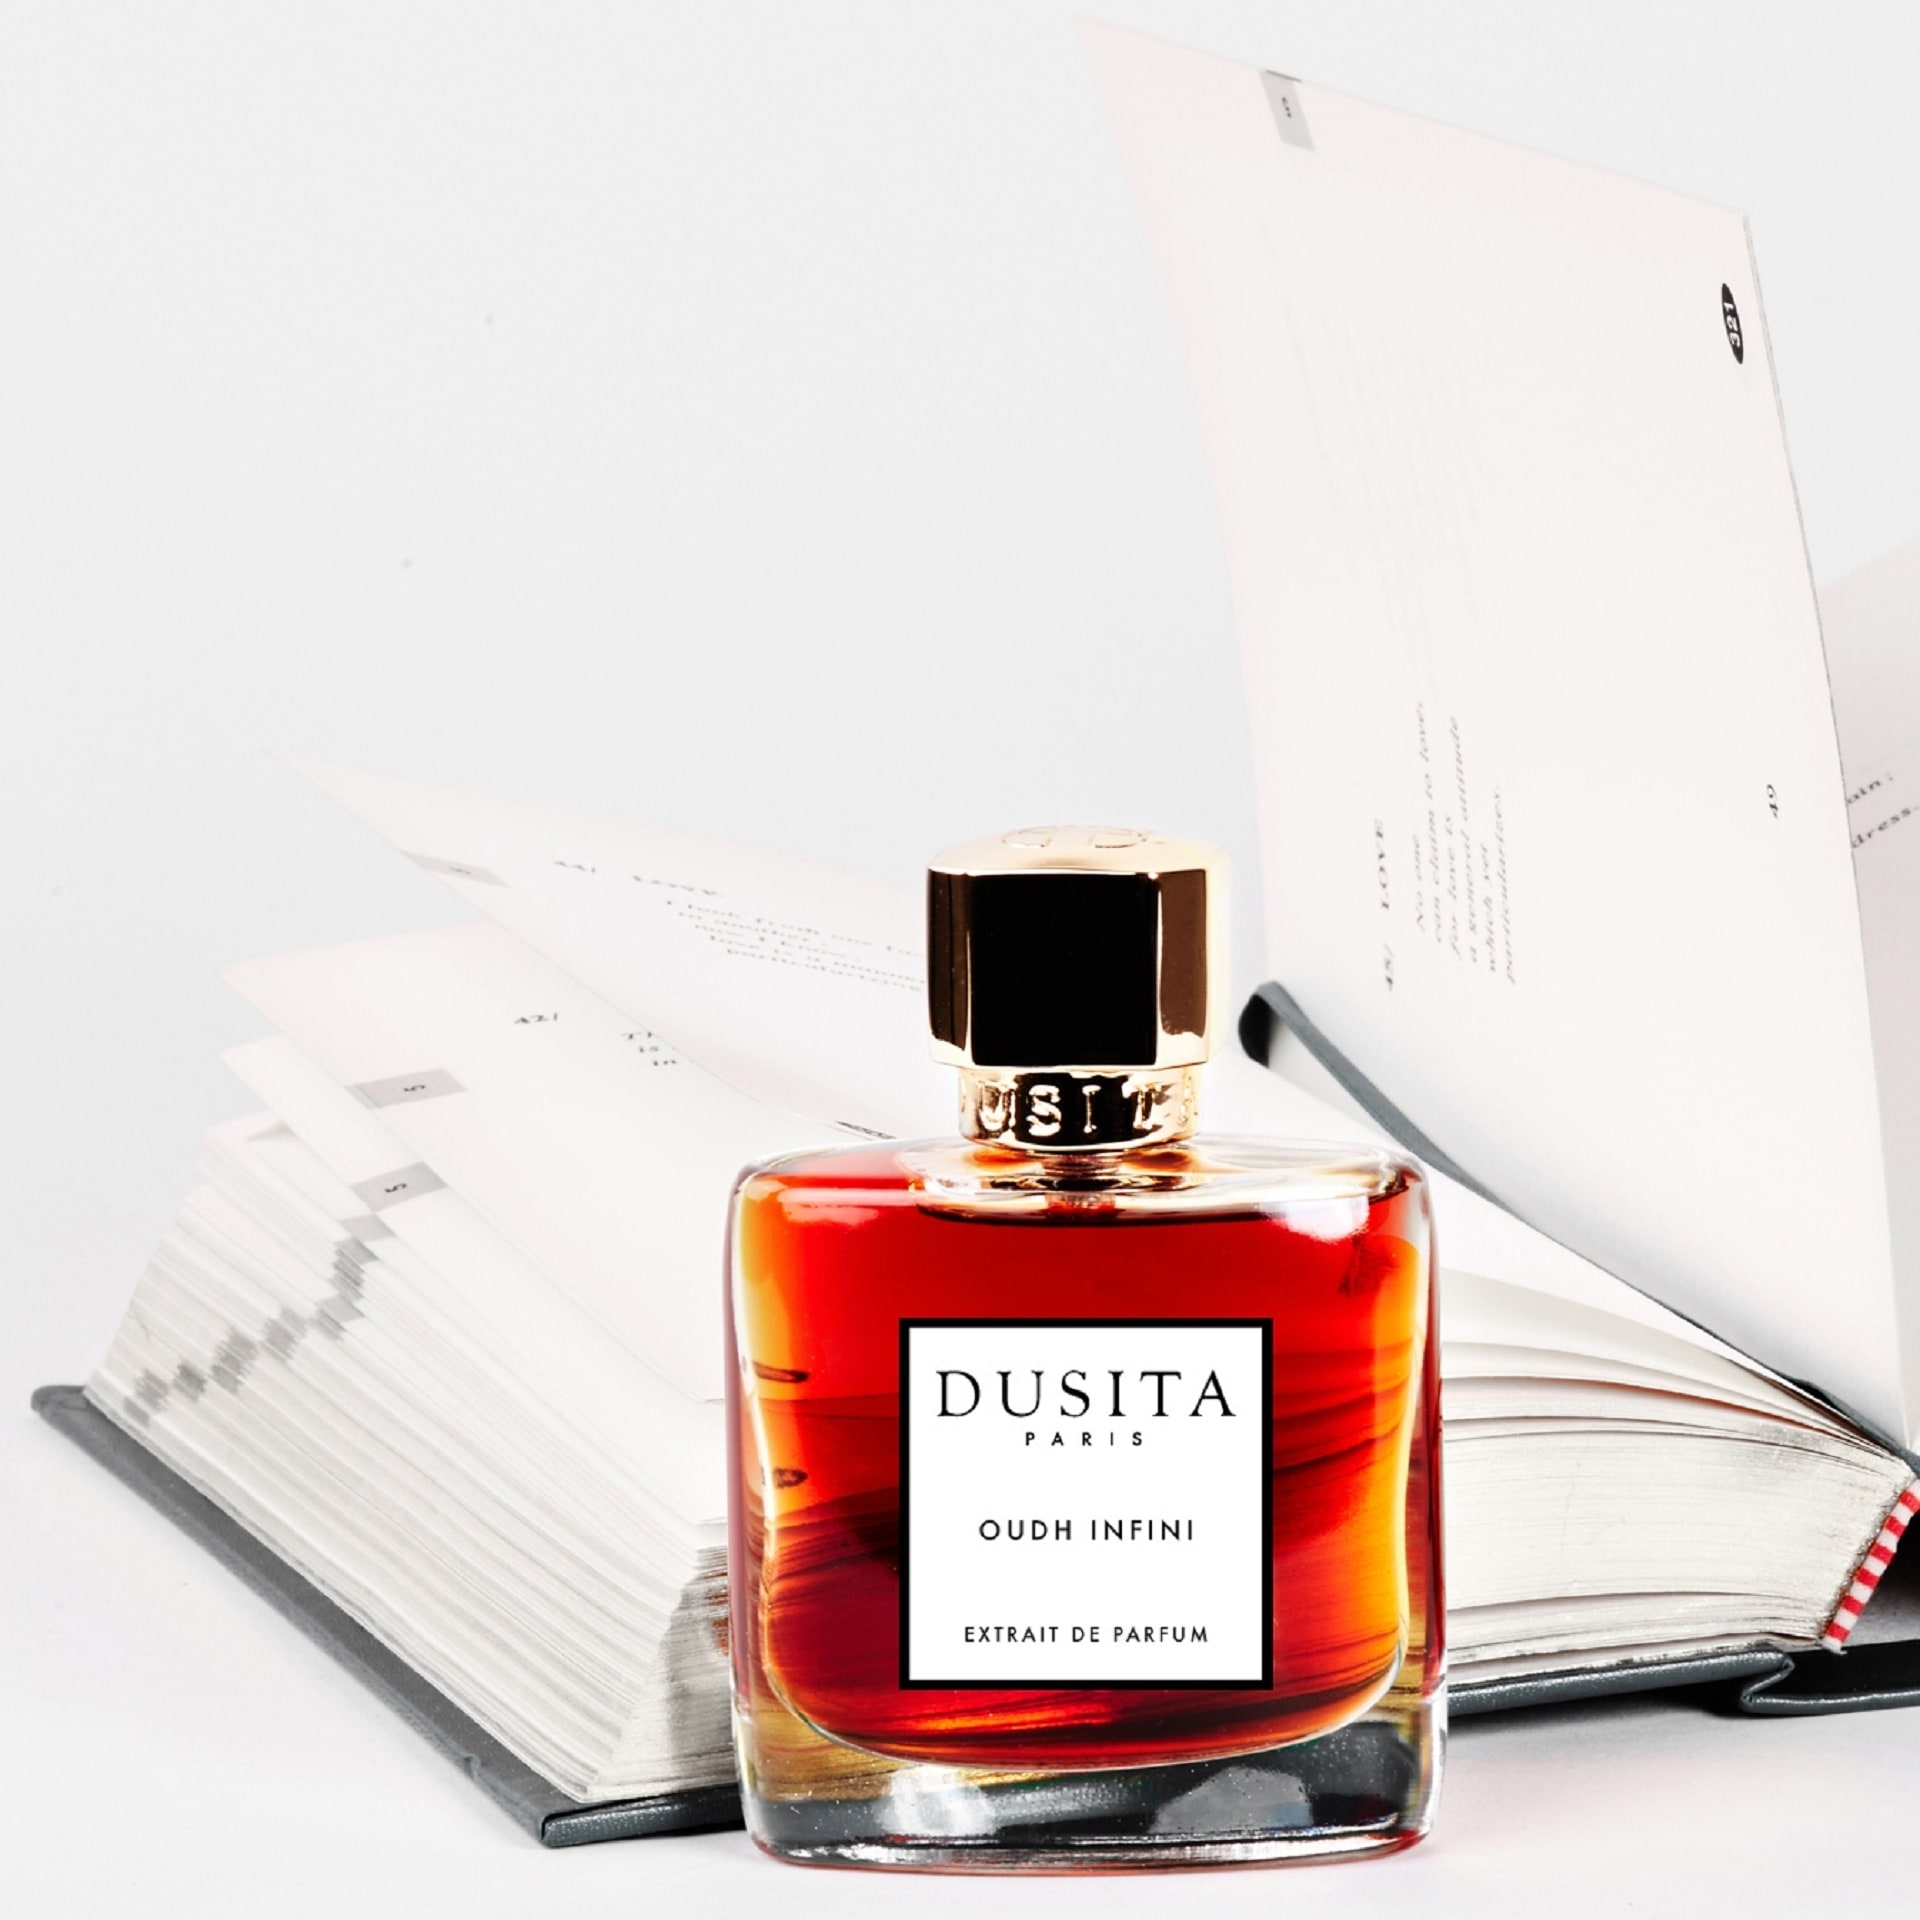 Духи Parfums Dusita Oudh Infini